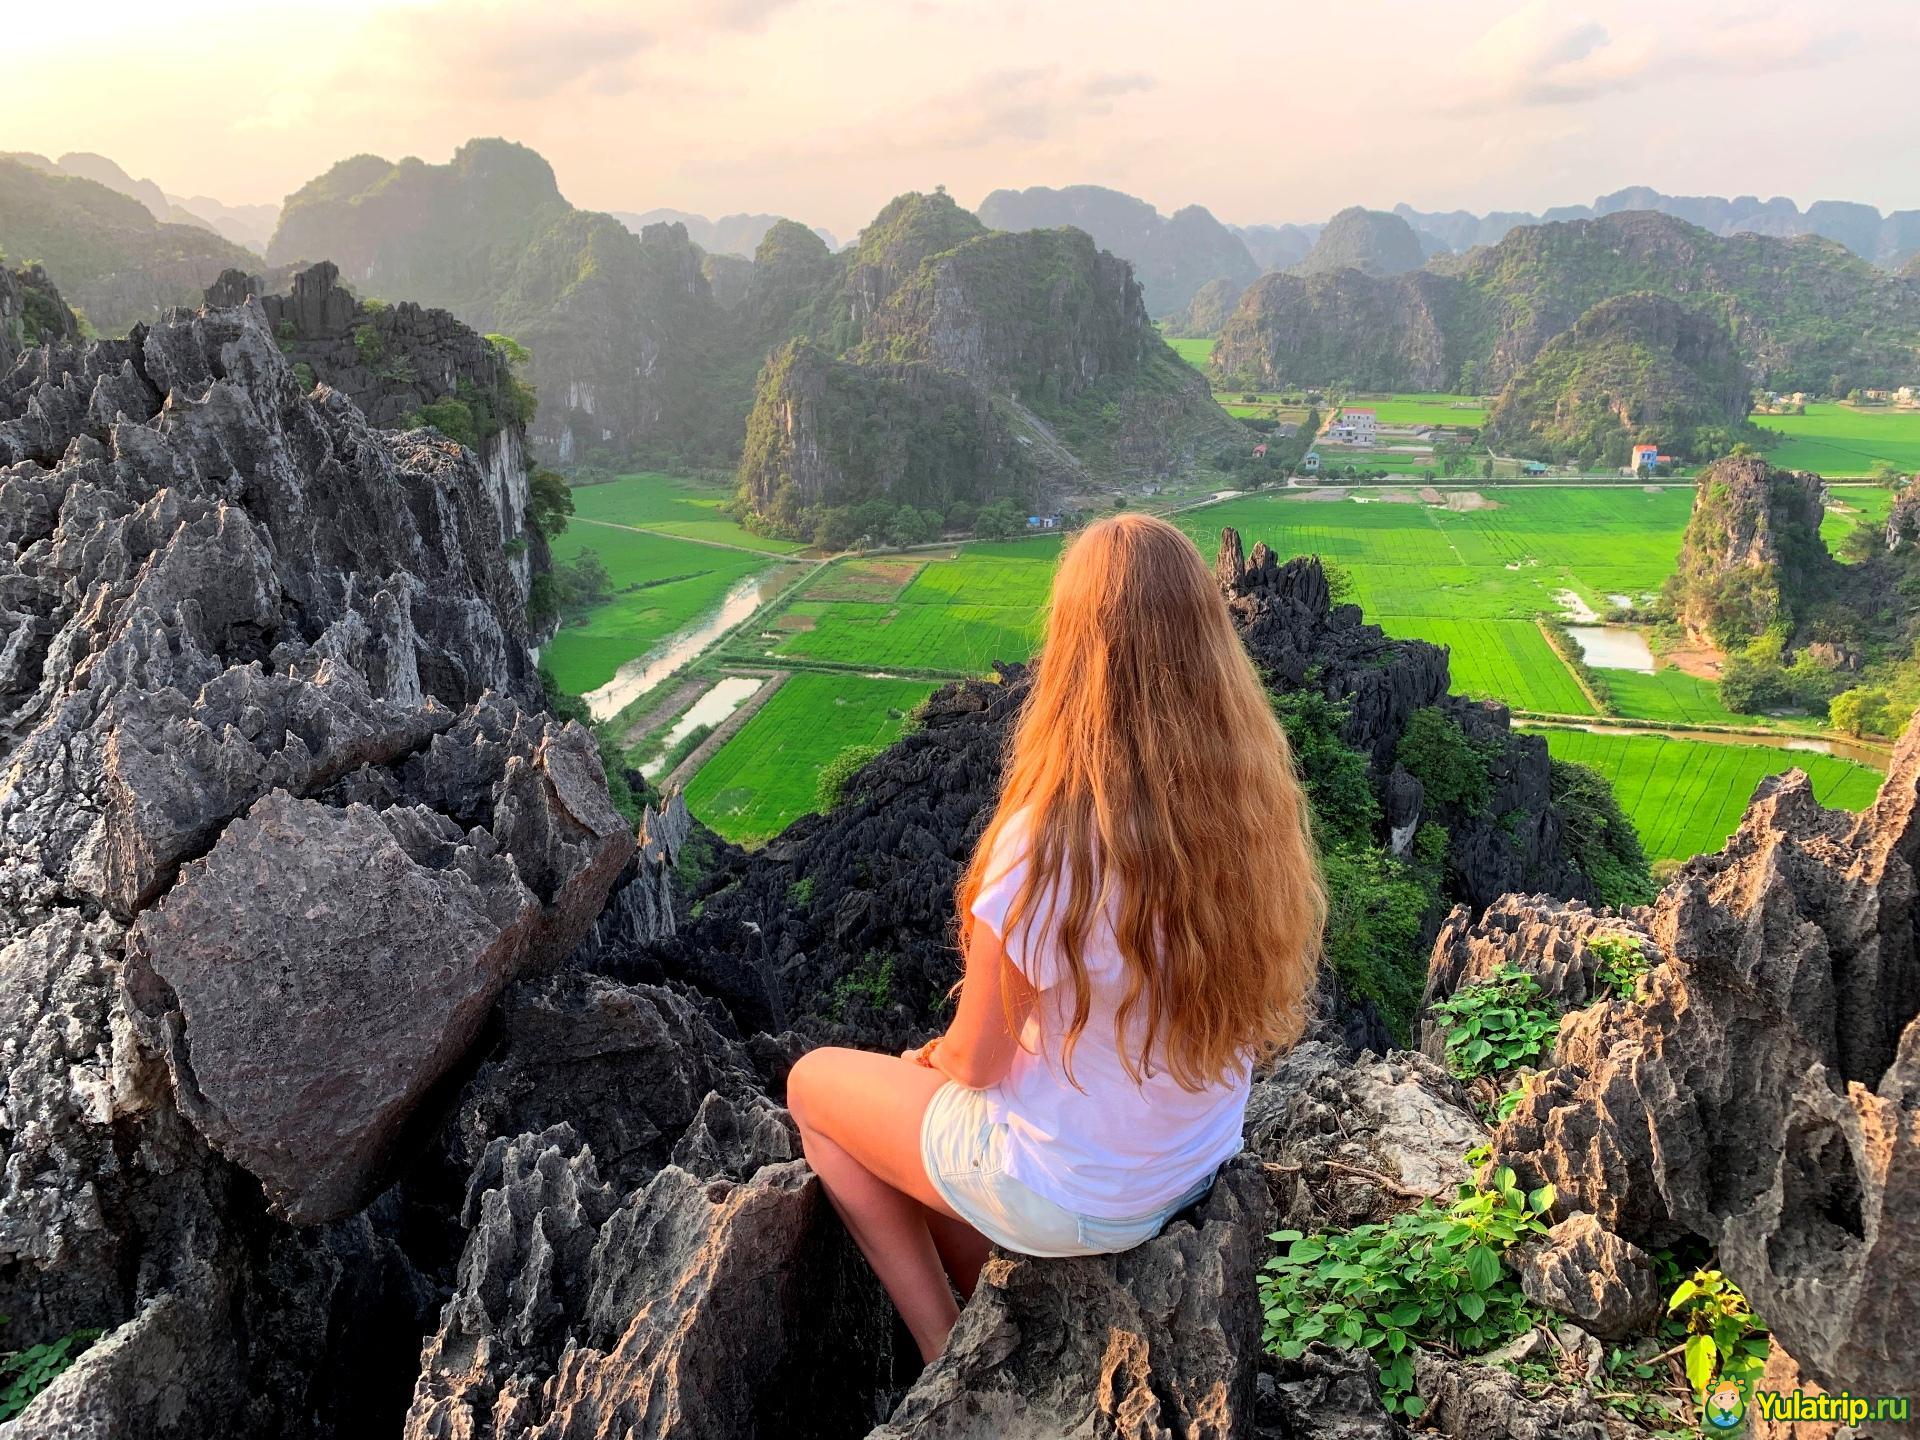 ханг муа mua caves нинь бинь вьетнам